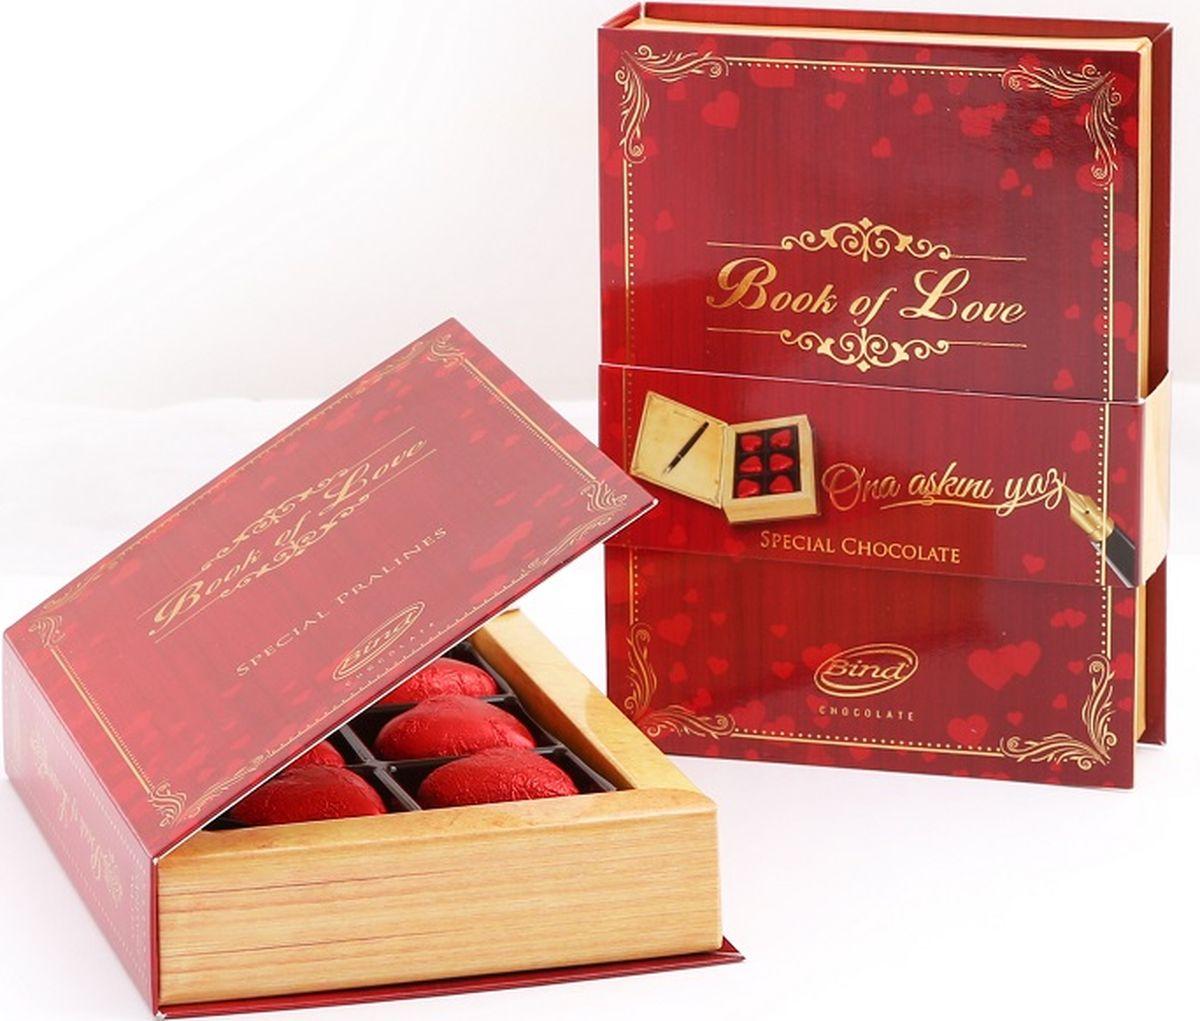 Bind Книга любви набор шоколадных конфет, 90 г спартак набор шоколадных конфет 300 г